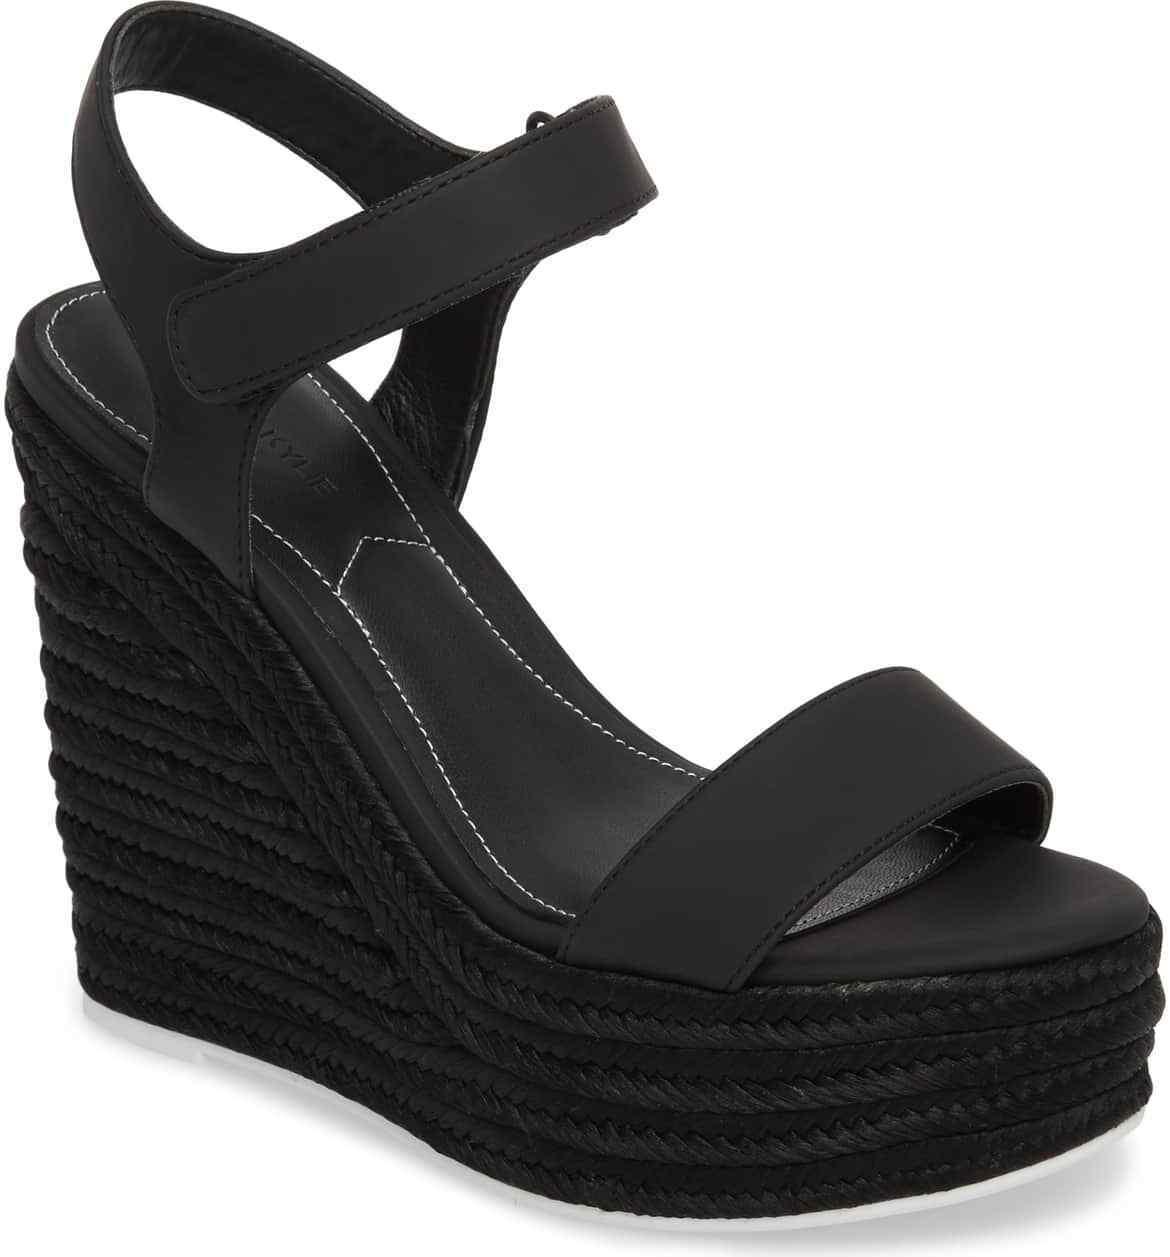 Kendall & Kylie Women's Grand Sport Espadrille Wedge Sandal Size 11 Black